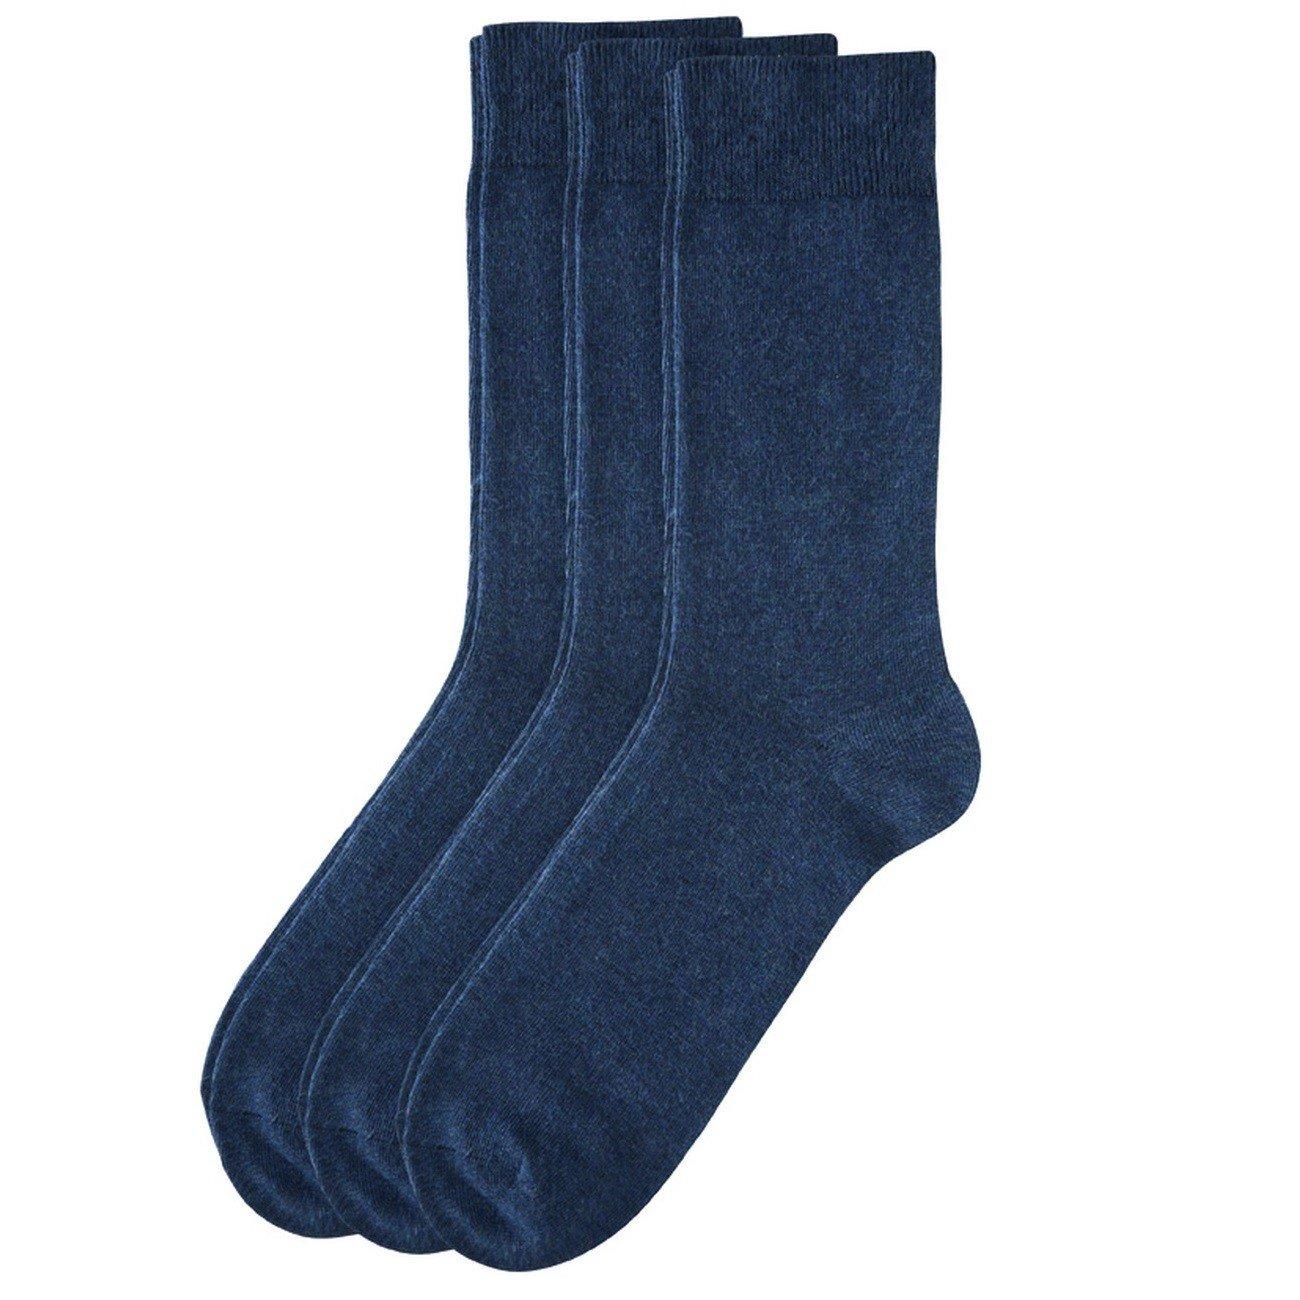 Camano Unisex-Erwachsene Socken B01M65J65O B01M65J65O B01M65J65O Socken Neuankömmling fdfa12